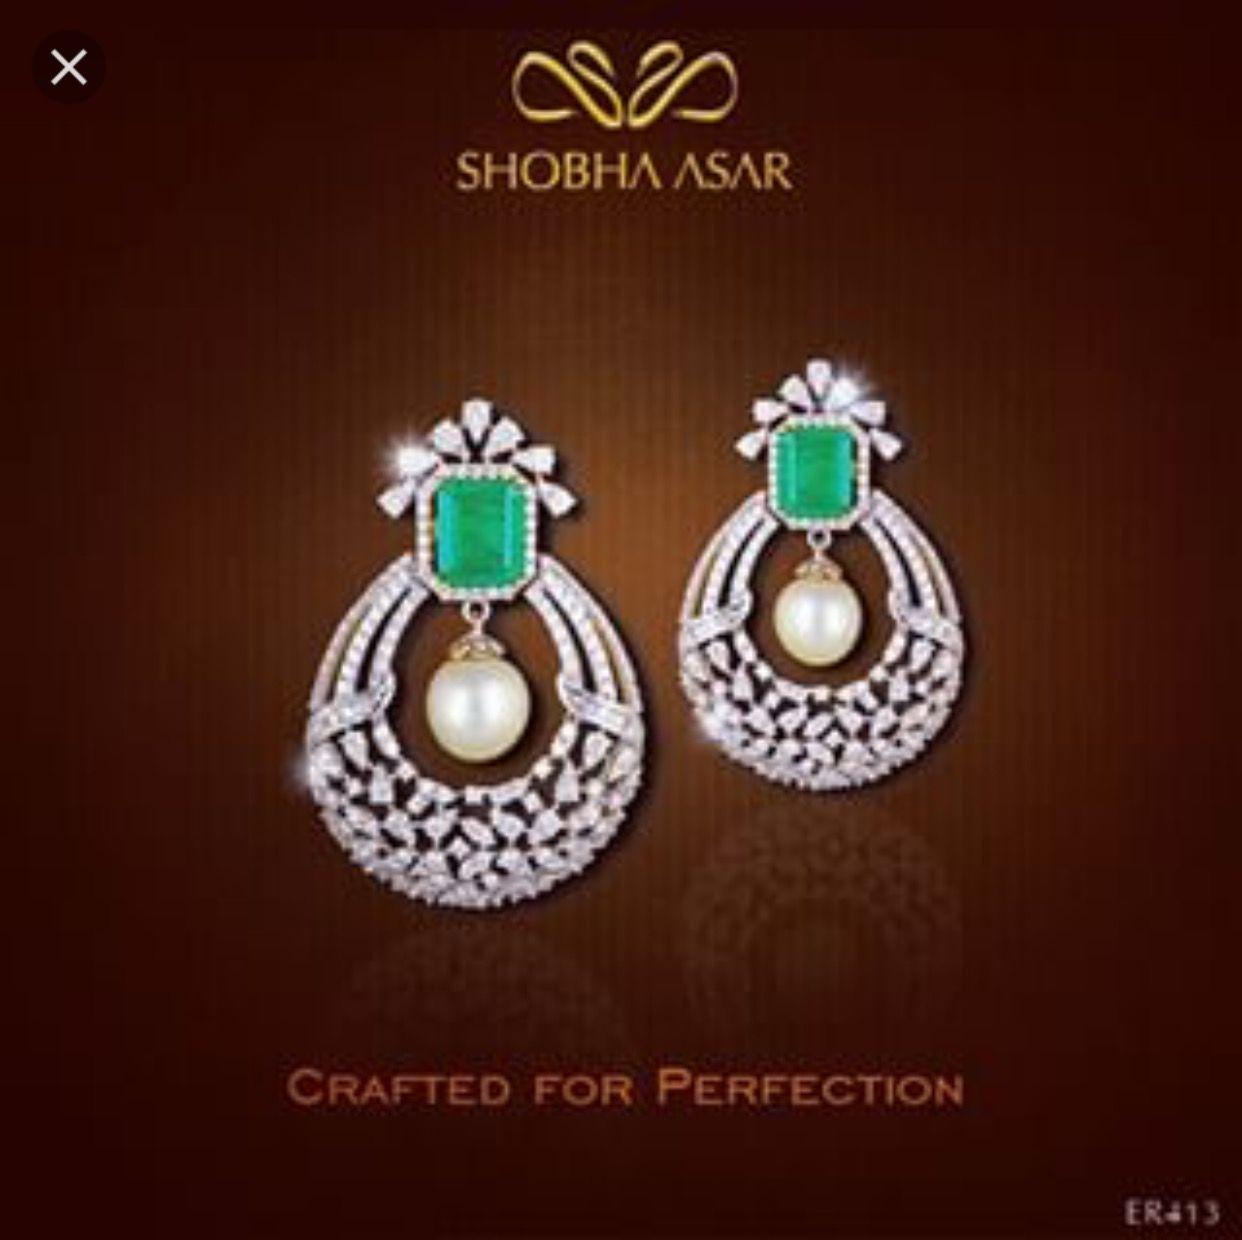 Pin by Vaishali Shah on Shobha Asar | Pinterest | Diamond, Indian ...